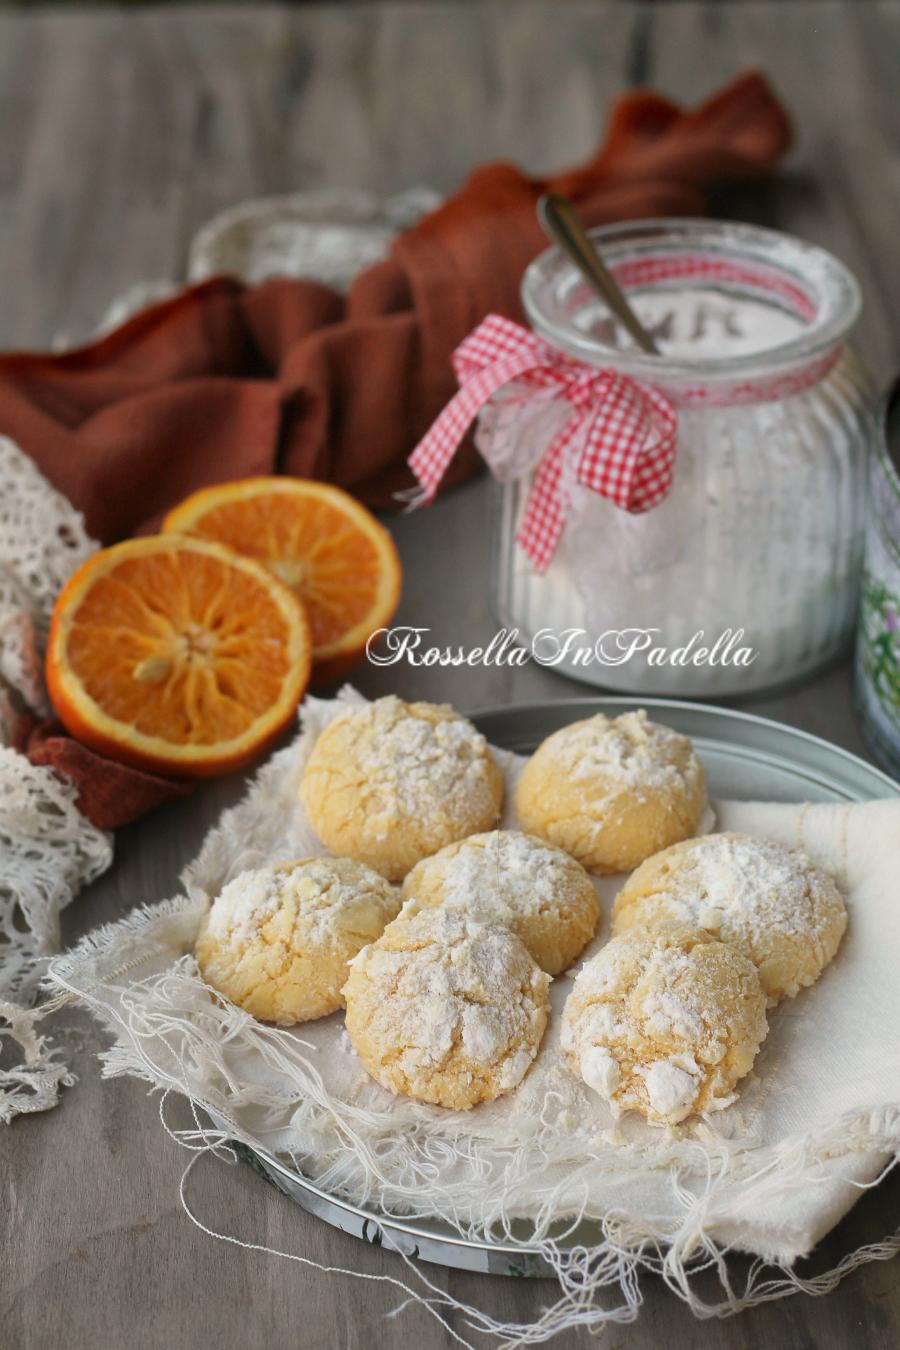 Biscotti all'arancia – orange crackles cookies